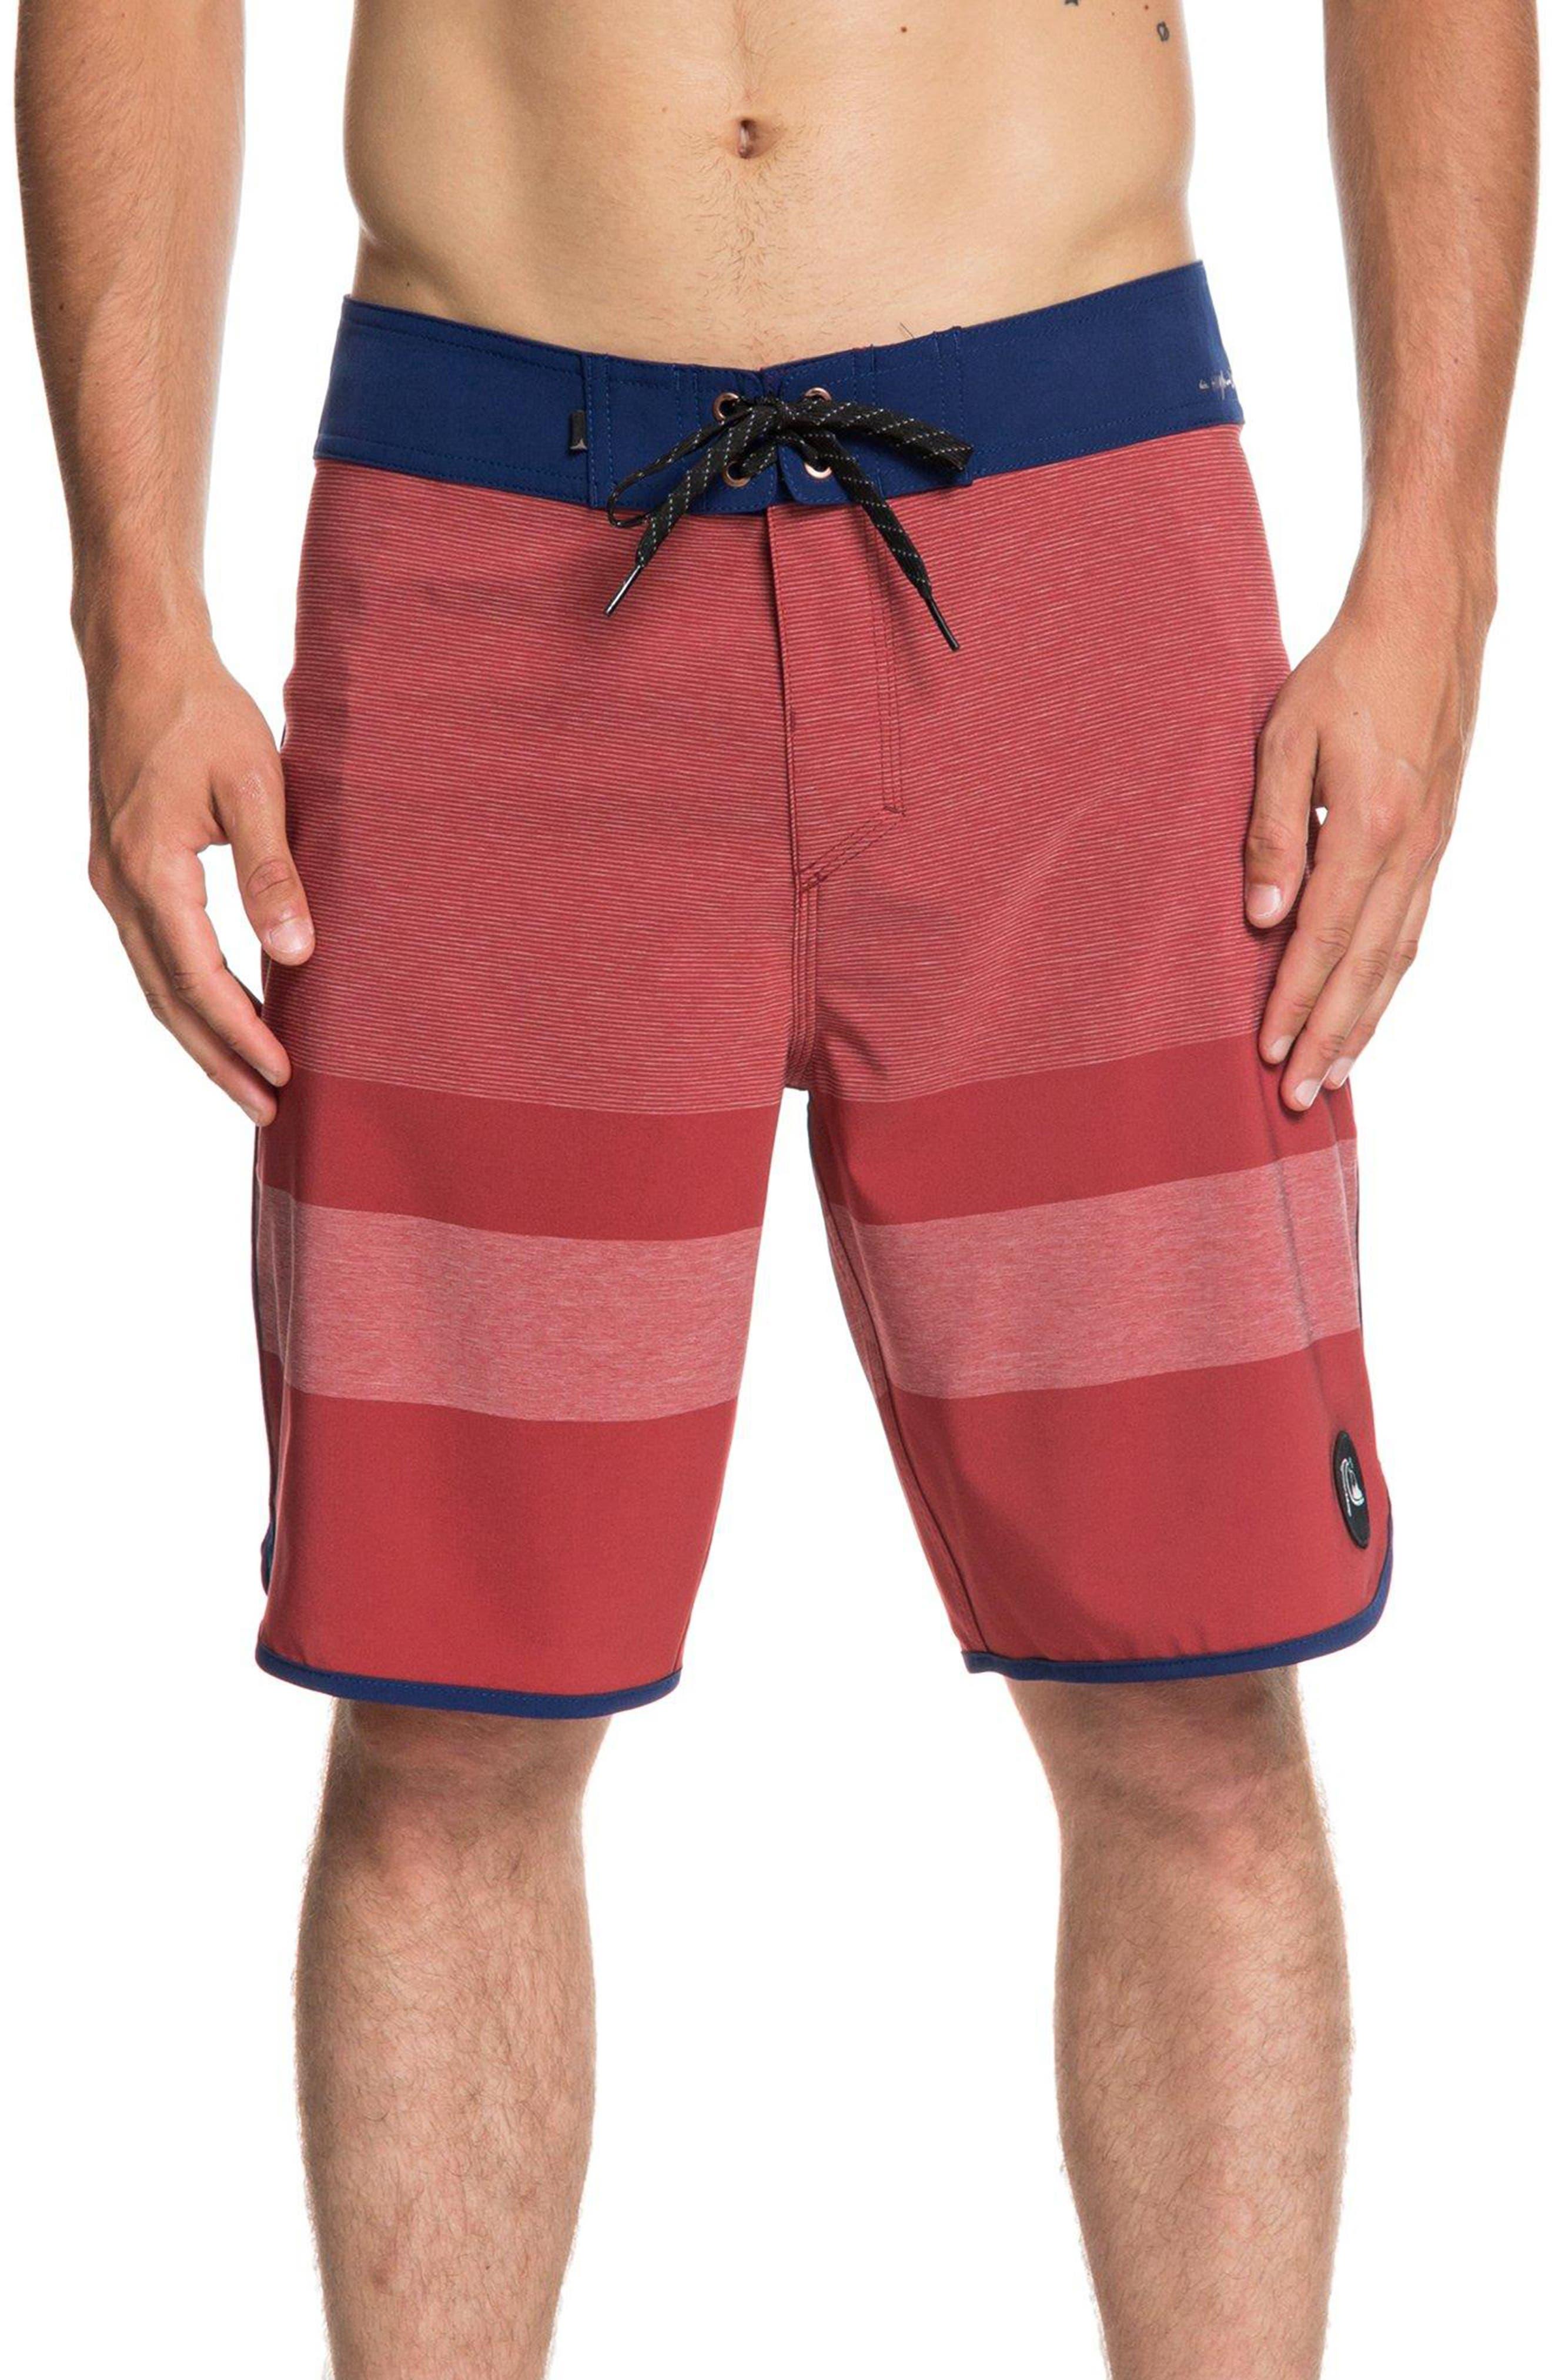 Quiksilver Shorts HIGHLINE TIJUANA 20 BOARD SHORTS